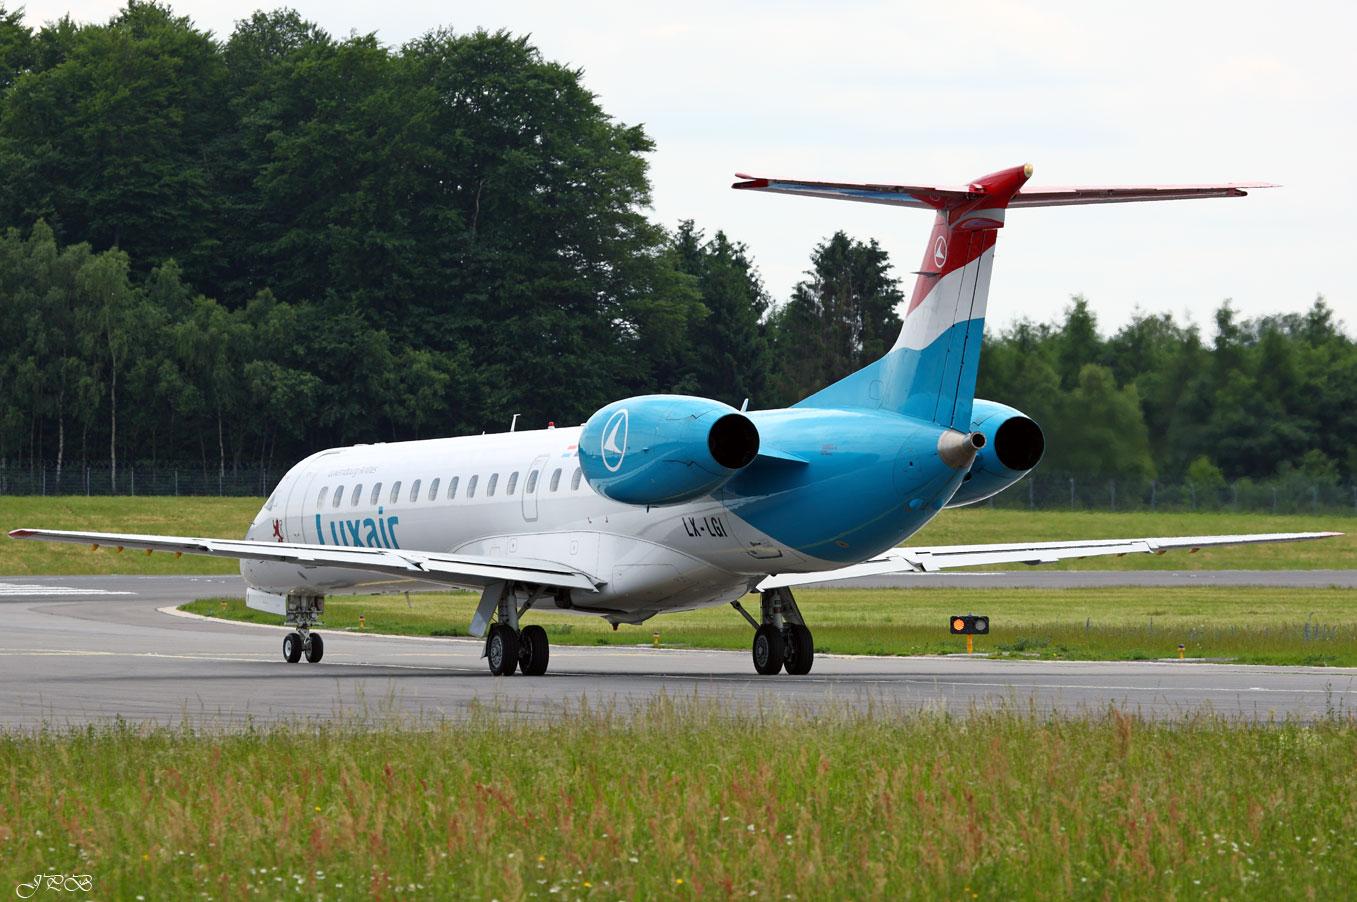 Luxair Embraer EMB-145